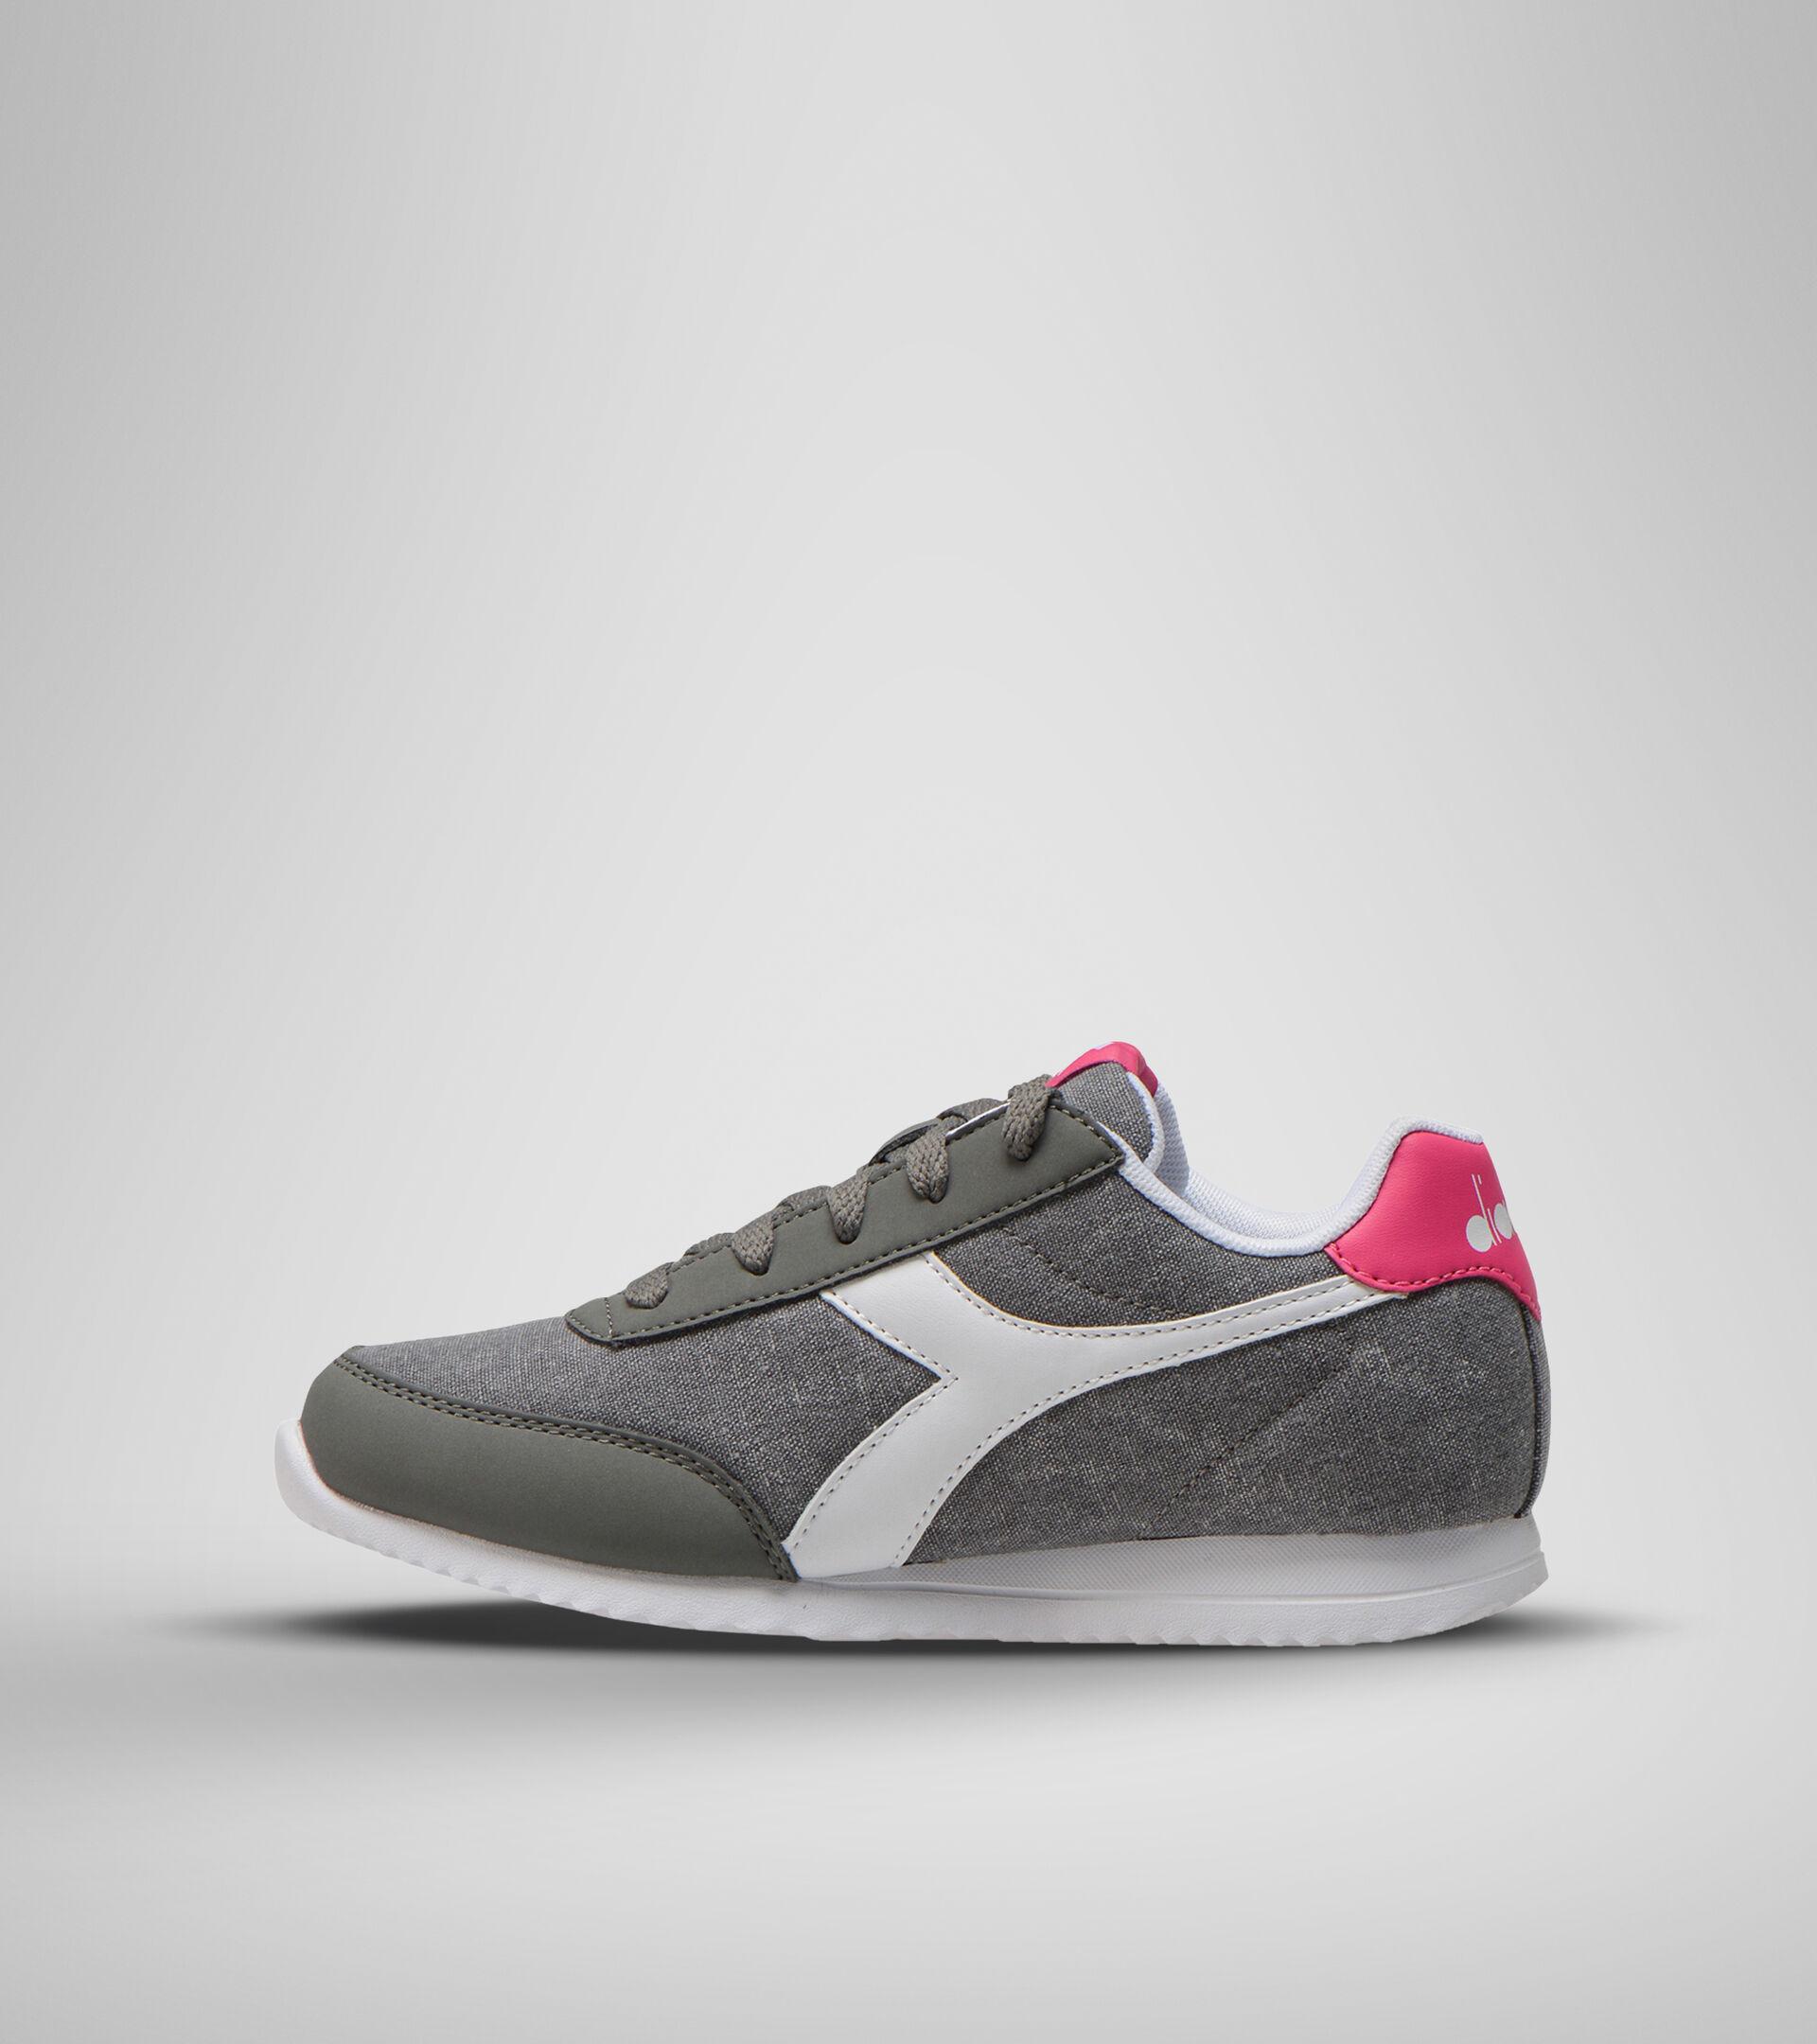 Footwear Sport BAMBINO JOG LIGHT GS GRIS CARBON/FANDANGO ROSA Diadora